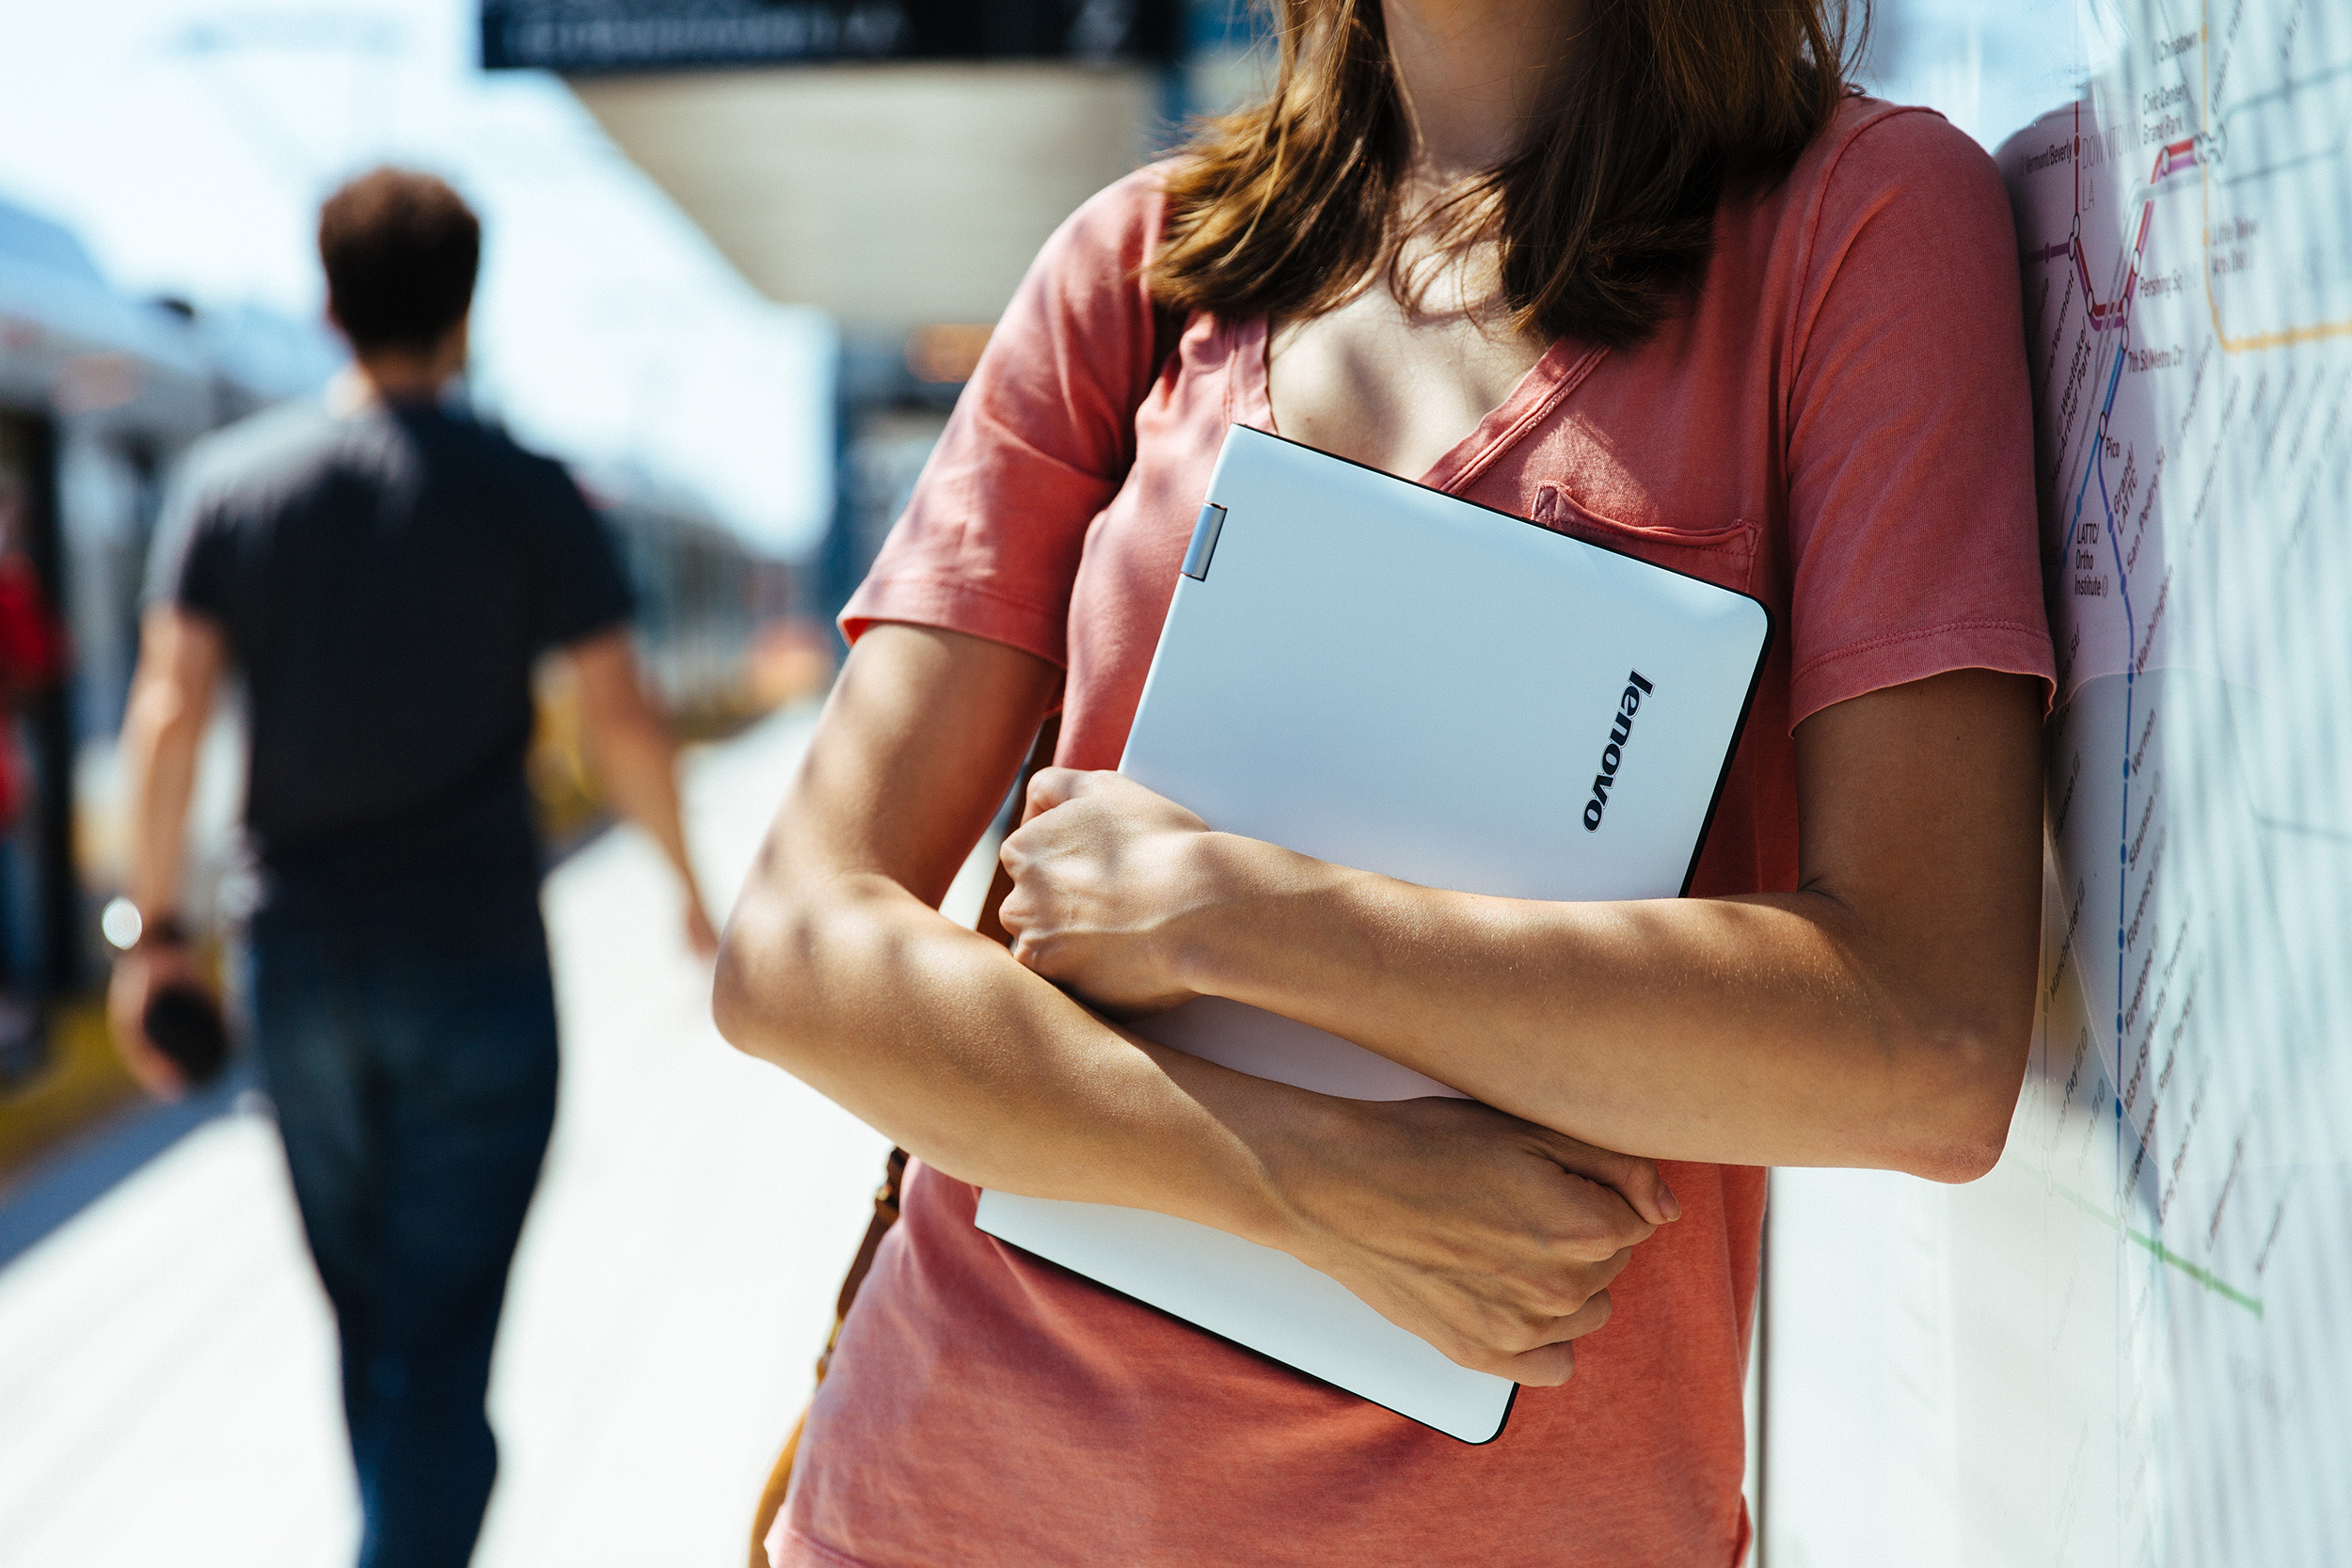 Lenovo Selects for Dave-3 copy.jpg